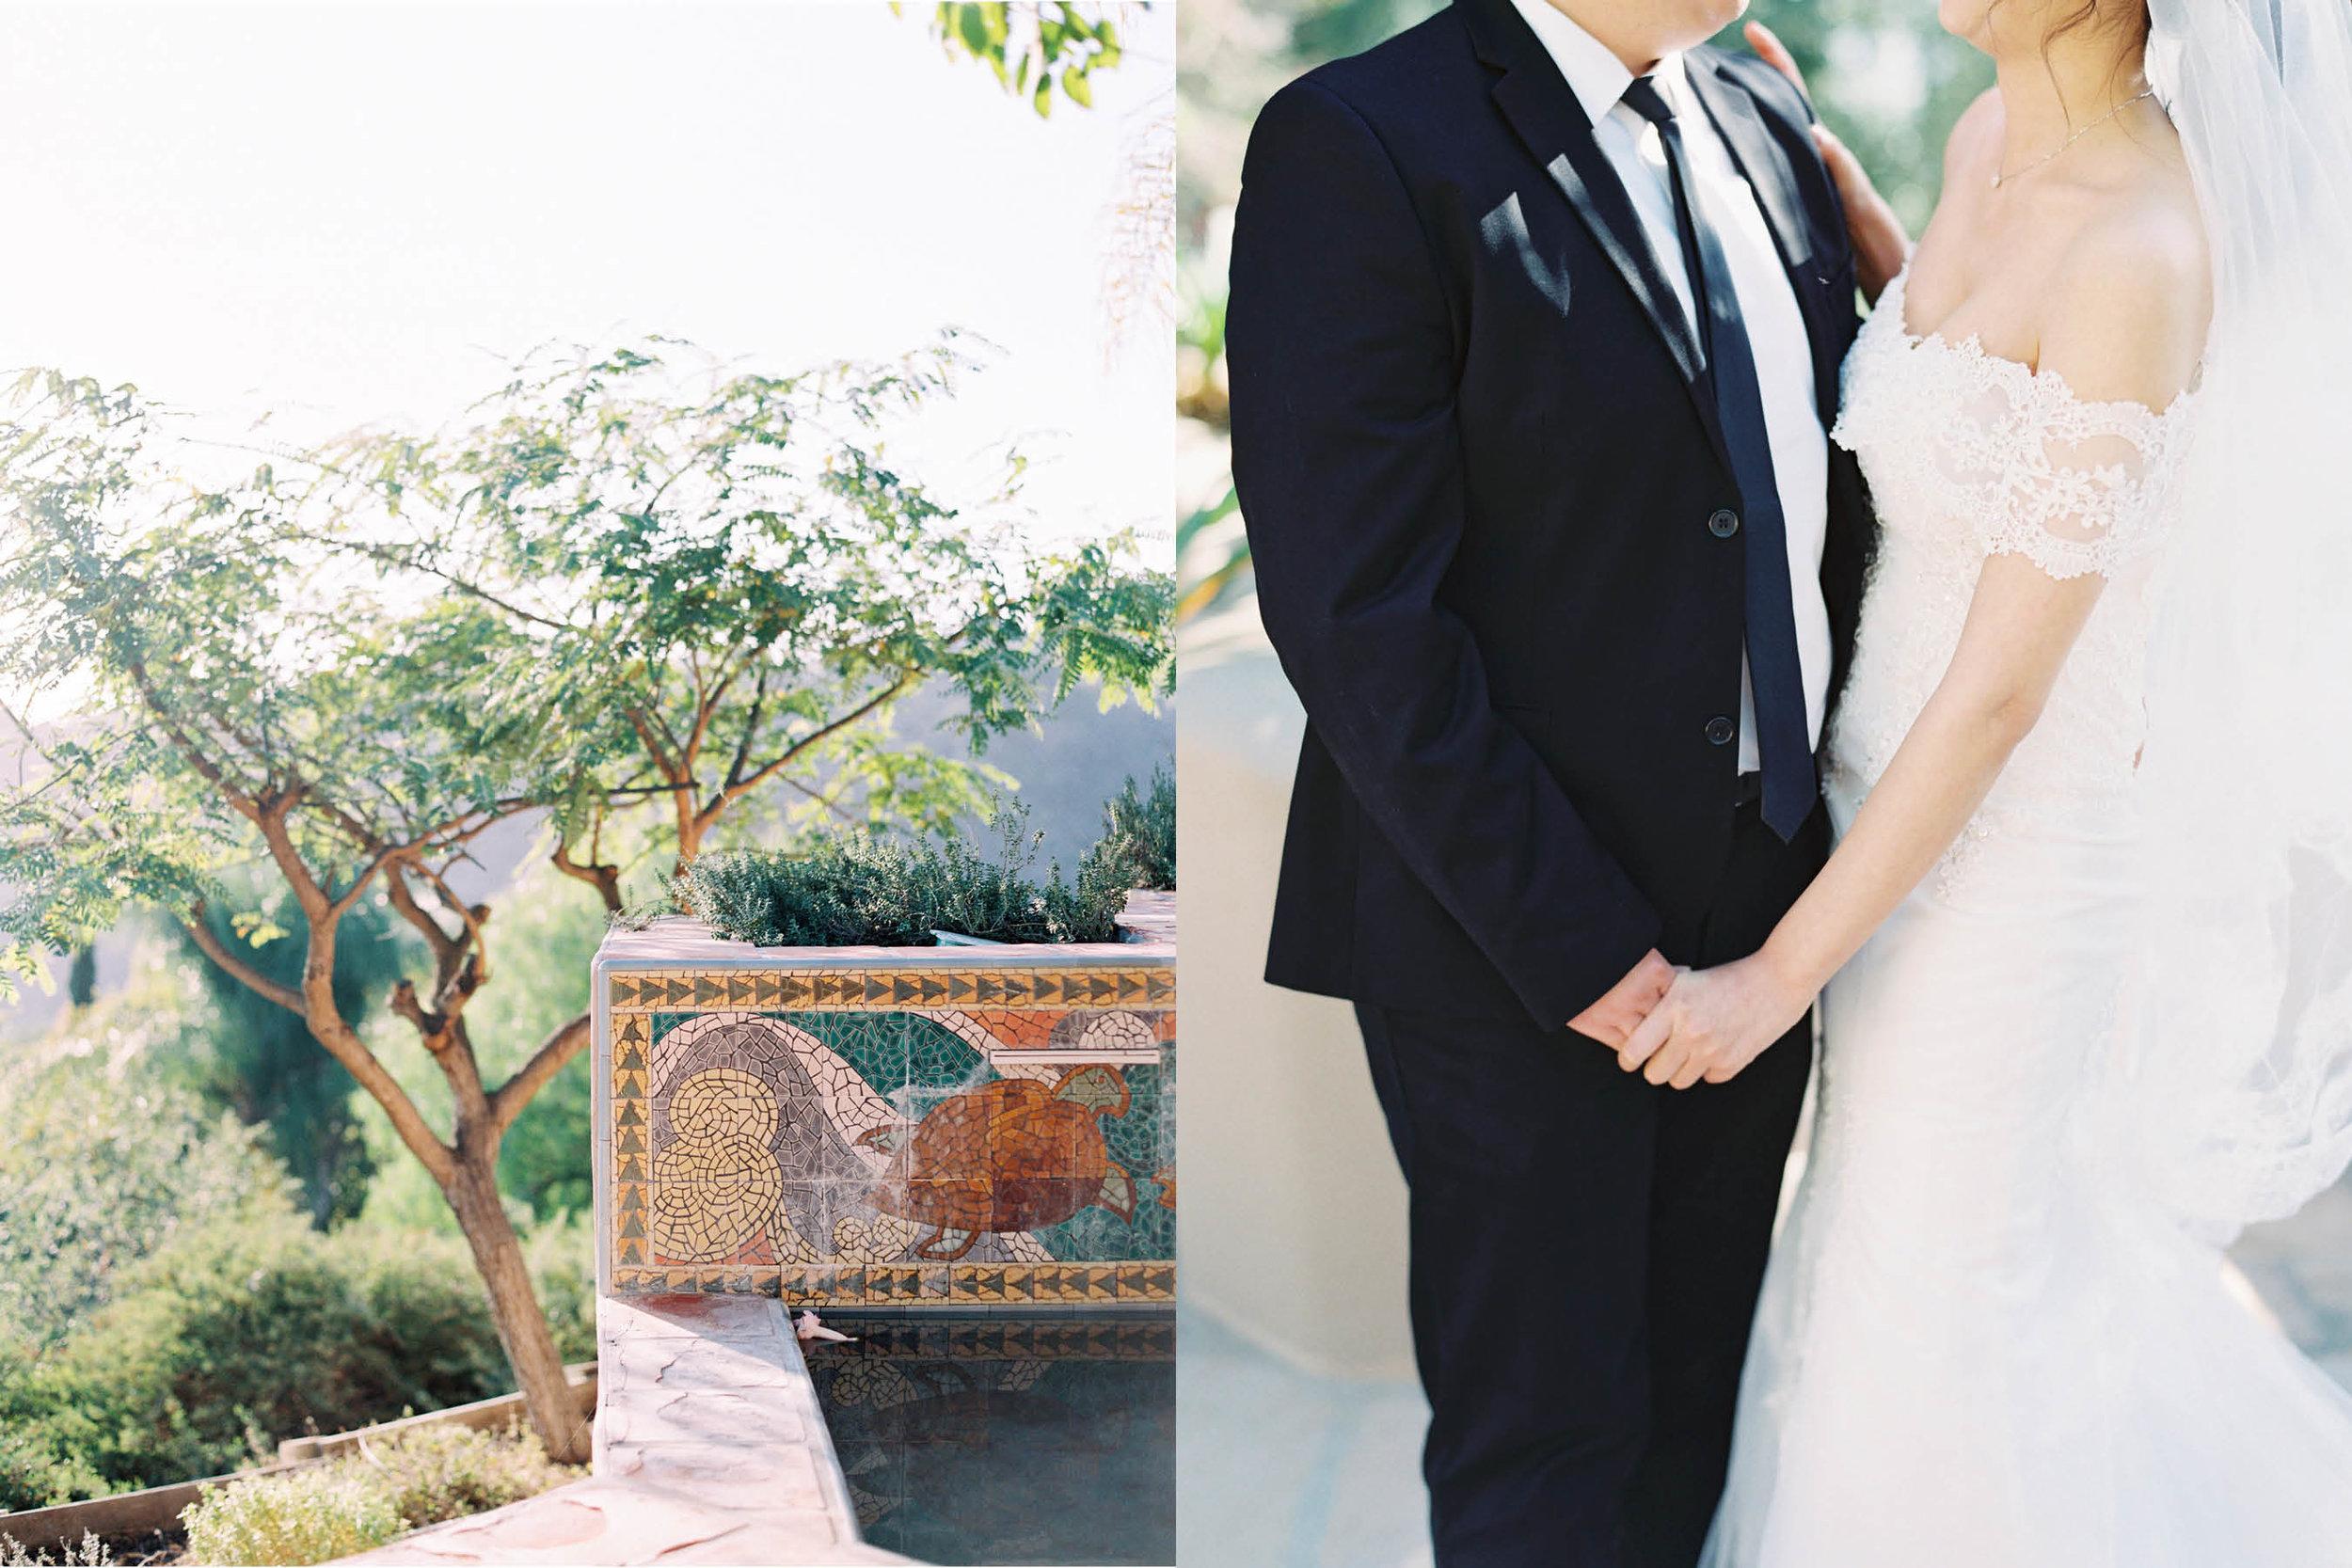 santa-barbara-elopement-wedding-planner-planning-coordinator-coordination-event-design-villa-verano-estate-riviera-garden-olive-tree-asian-day-of-palm-tree (5).jpg